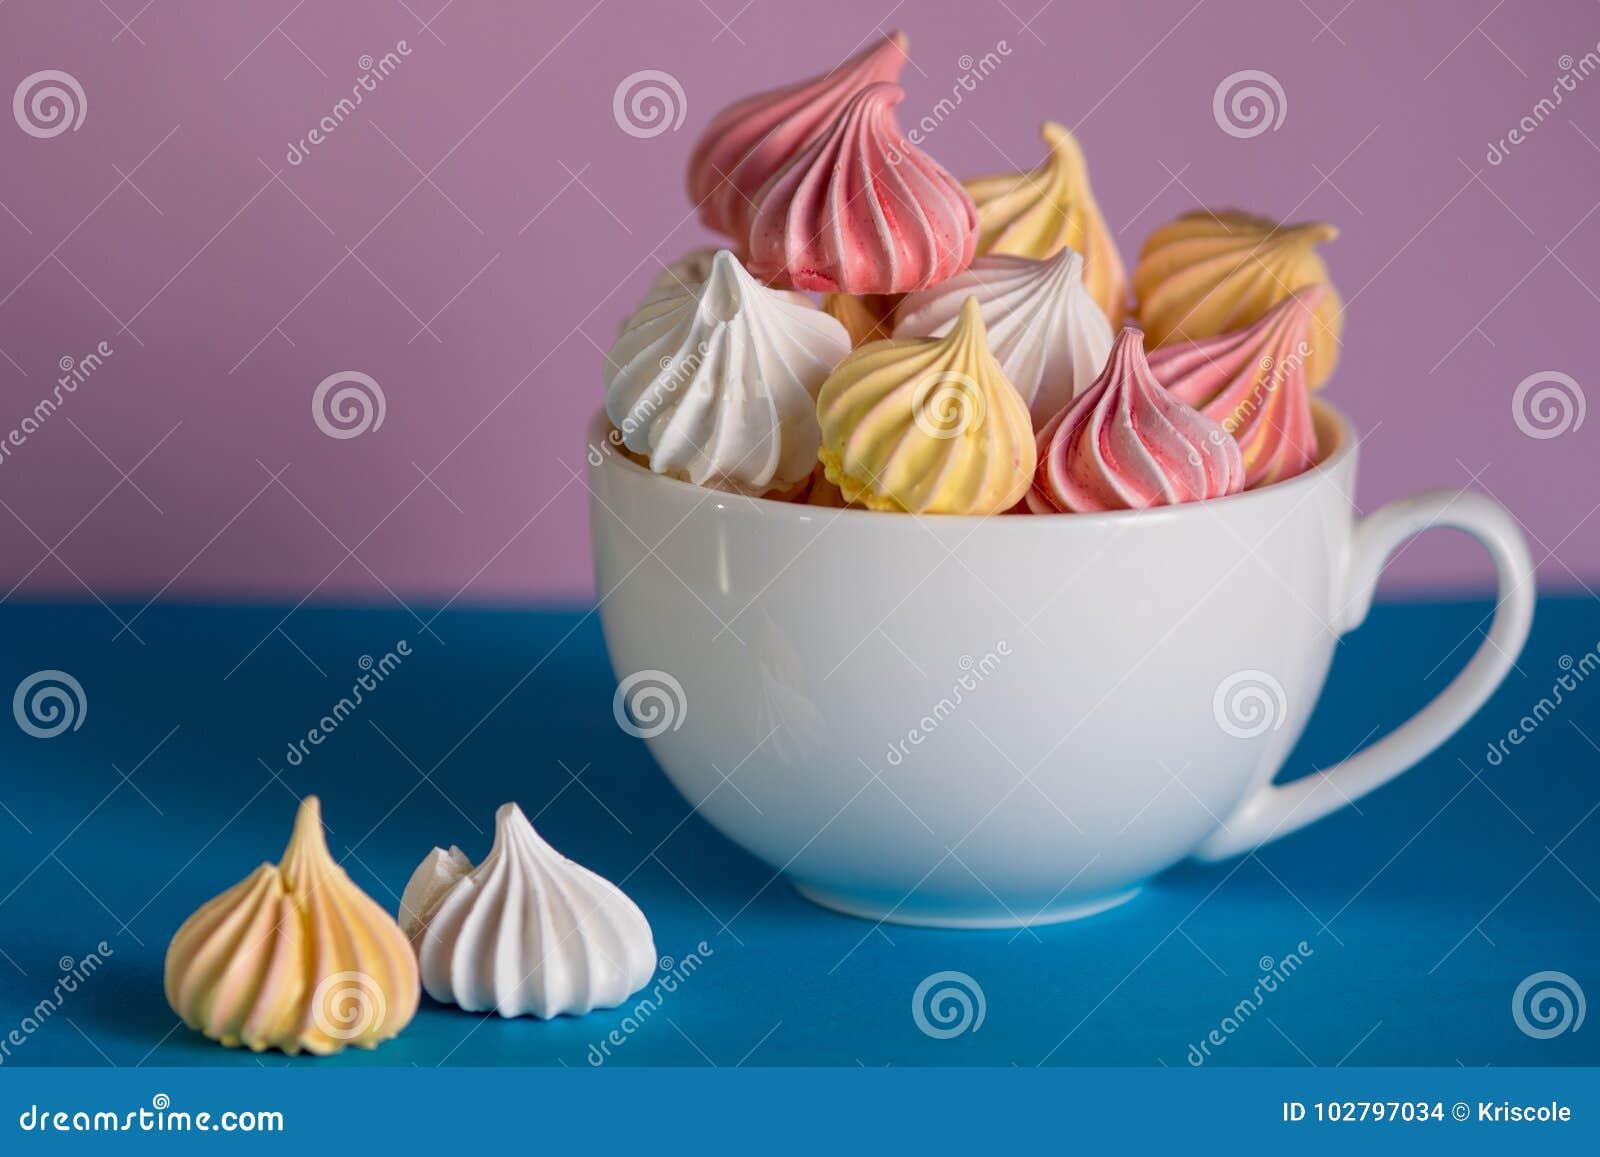 Nachtisch mit Meringe, viele bunten Meringen in der Tee Schale